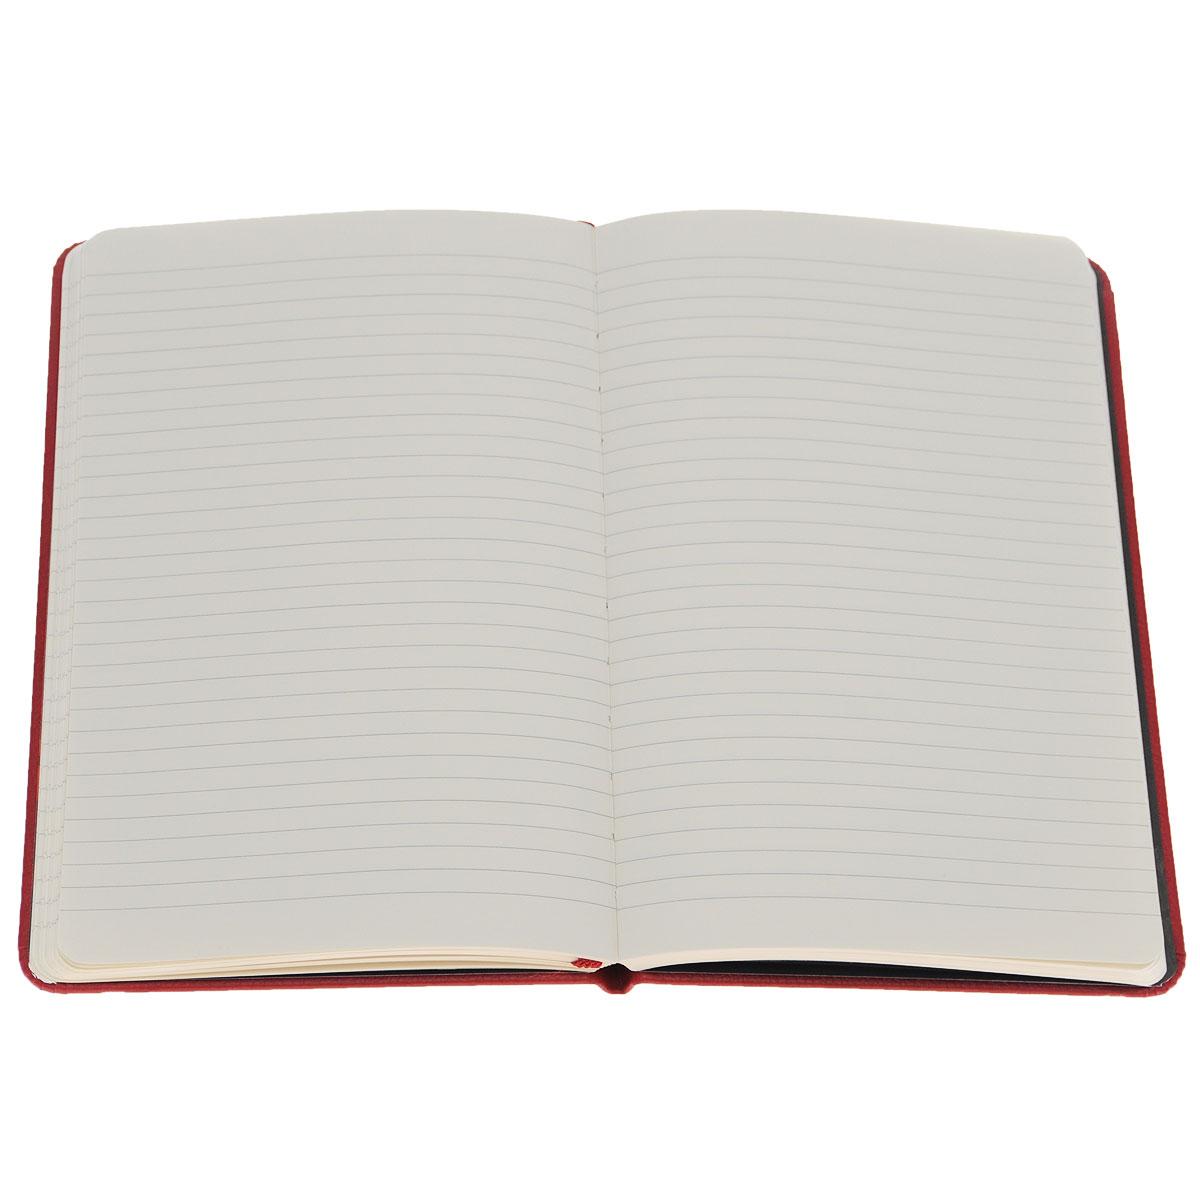 Diablo Burning Hells: Hardcover Ruled Journal